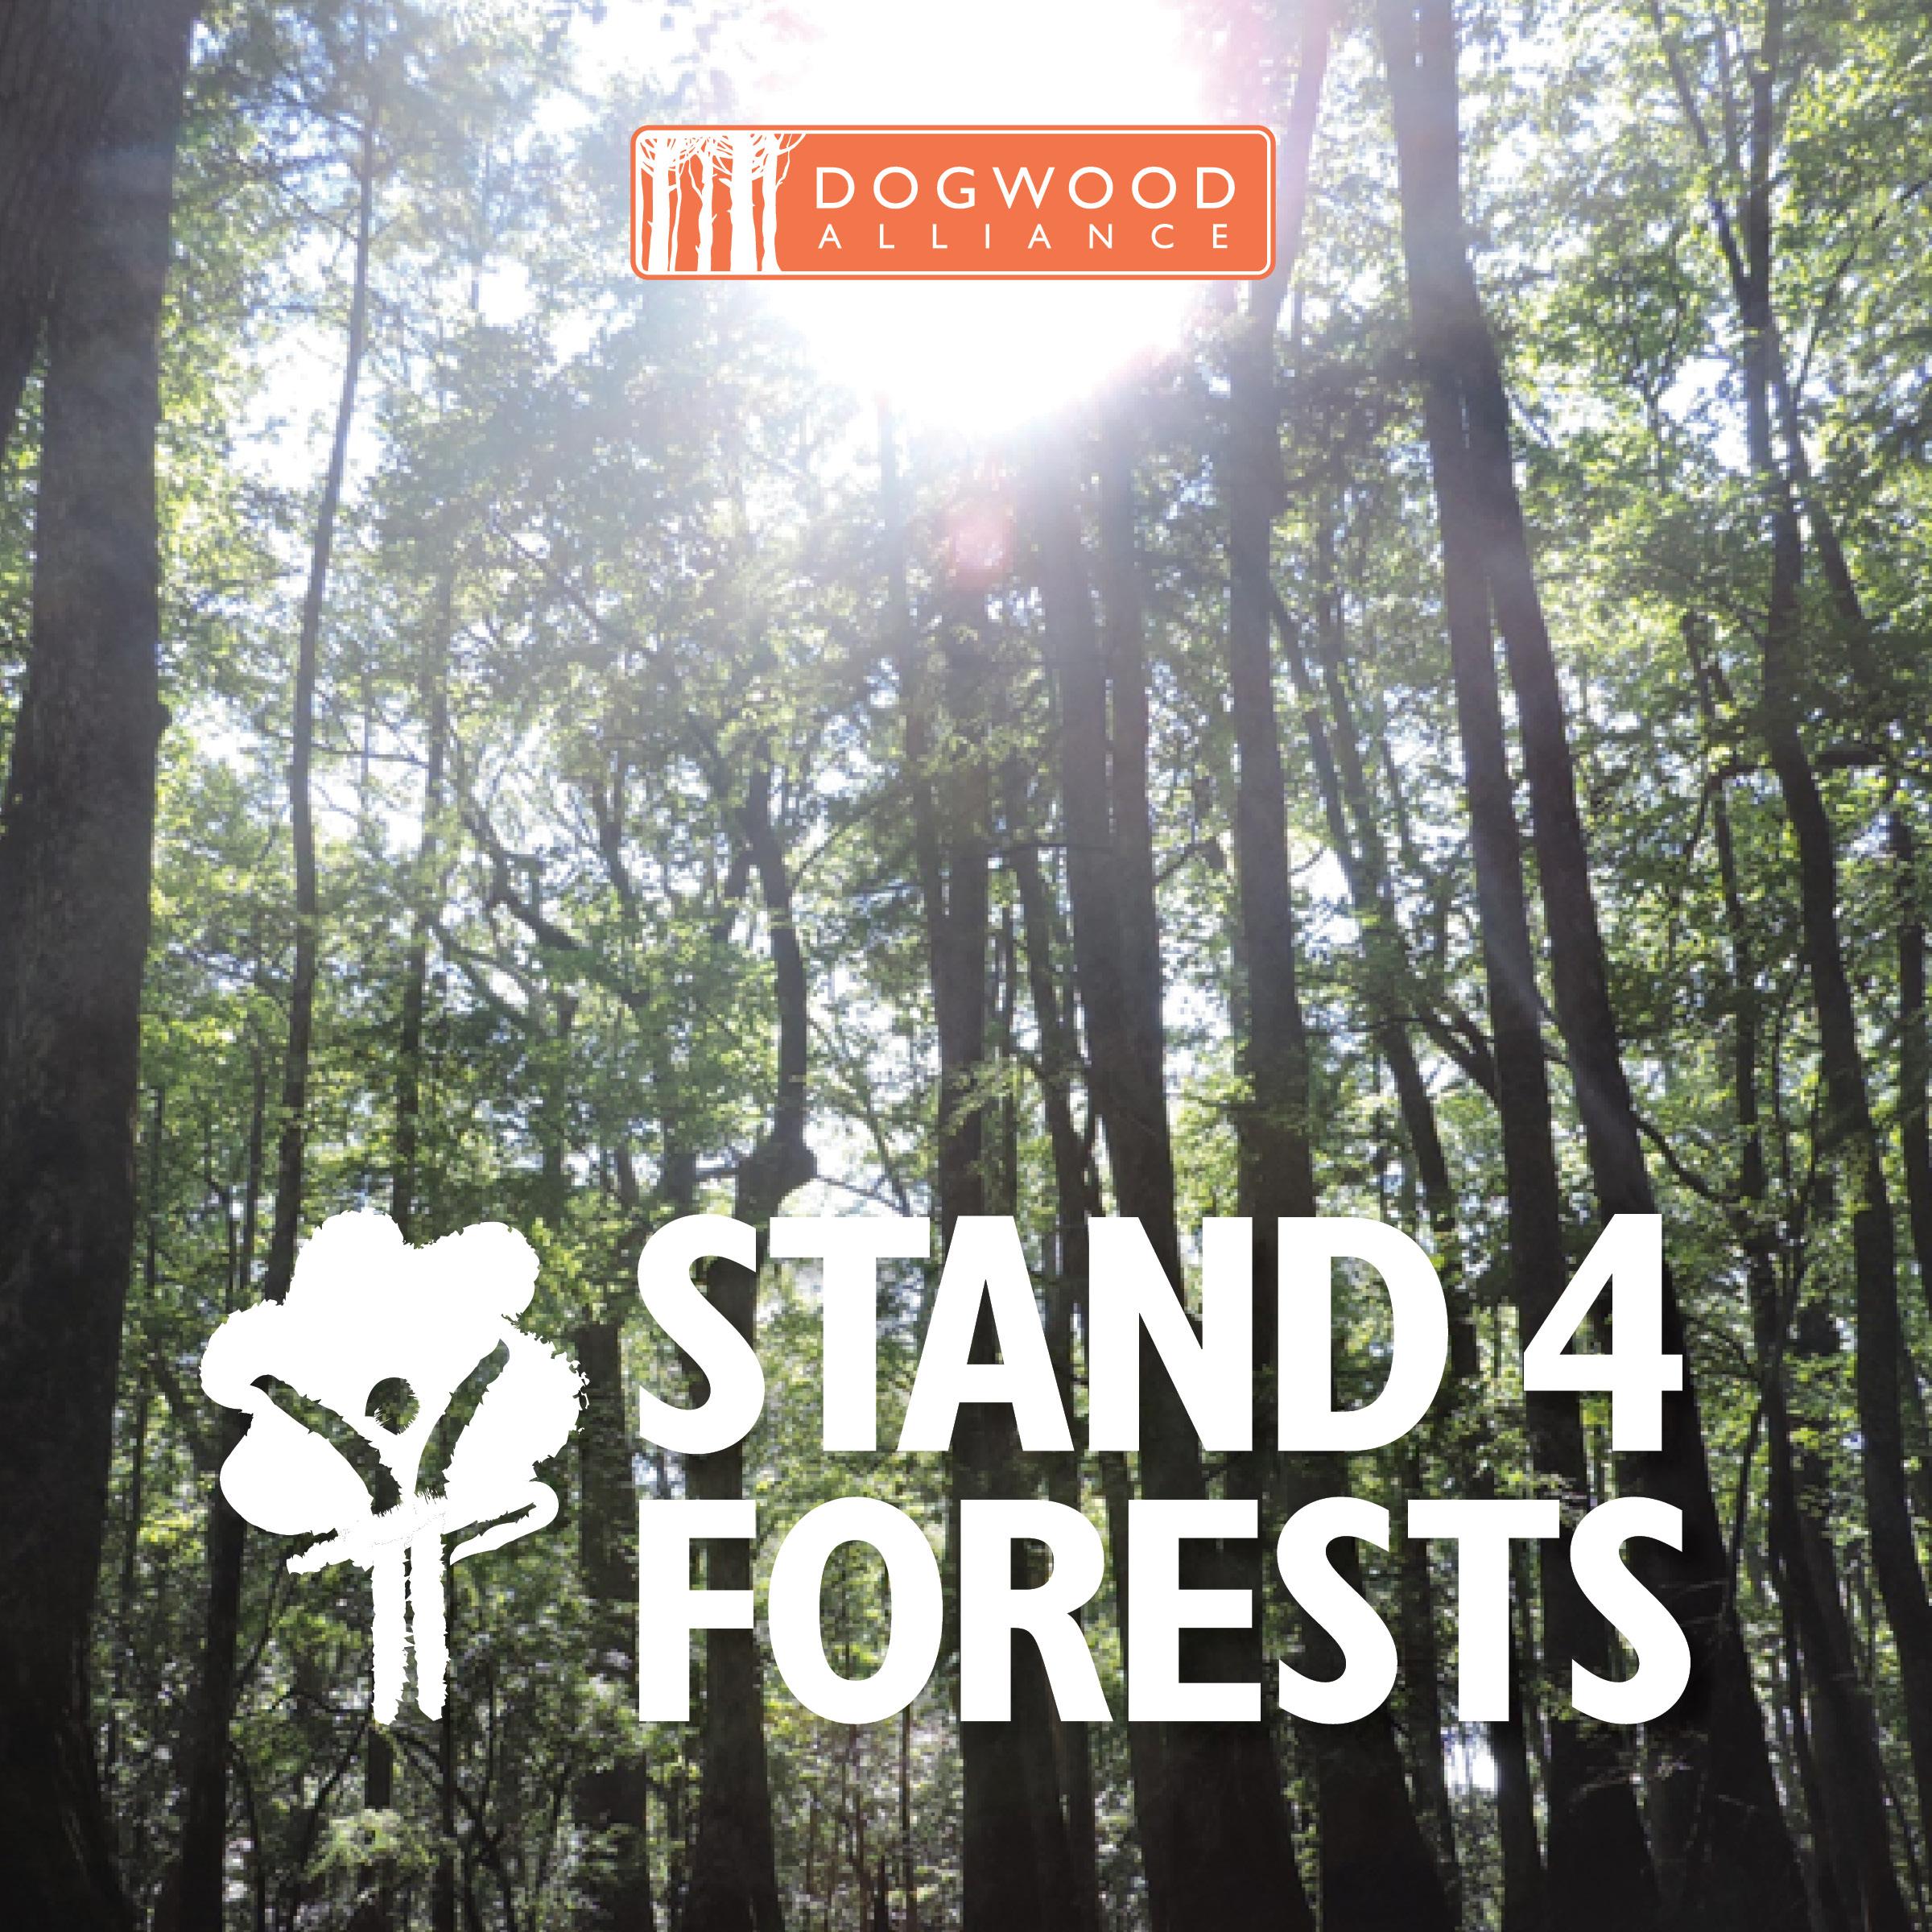 17-DWA-002_Stand4Forests_SocialMedia_v13.jpg